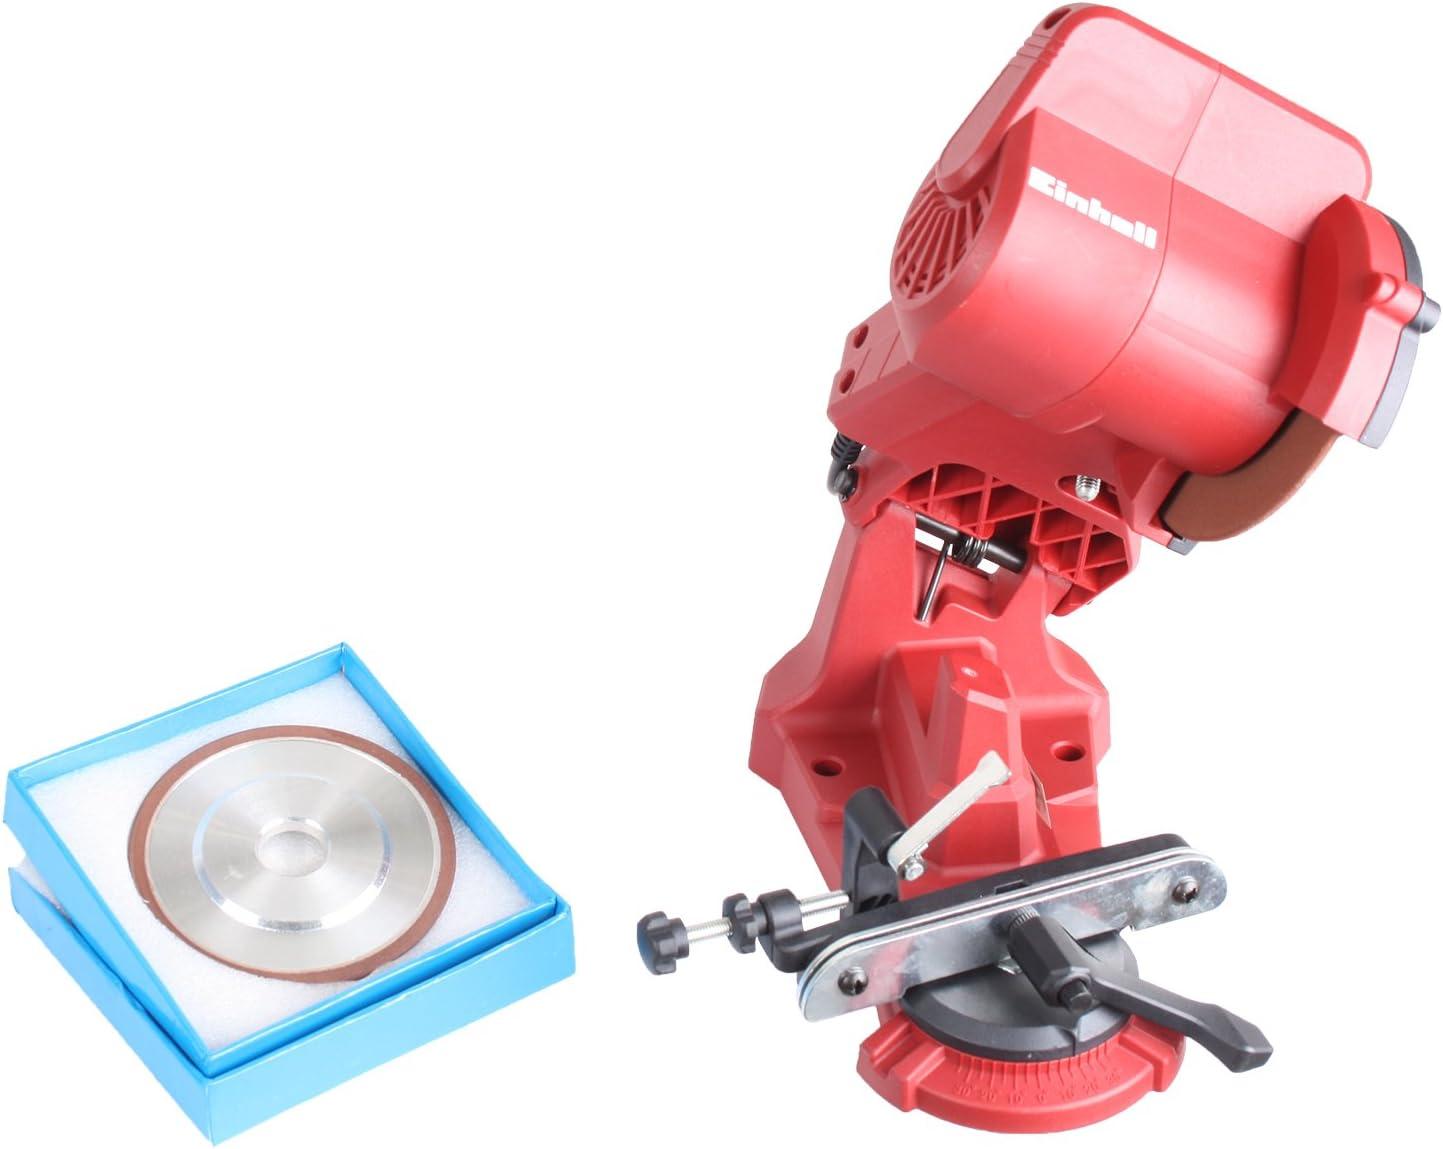 Set Einhell S/ägekettensch/ärfger/ät GC-CS 85 E mit GARDINGER Diamantschleifscheibe 108x3,2x23 mm